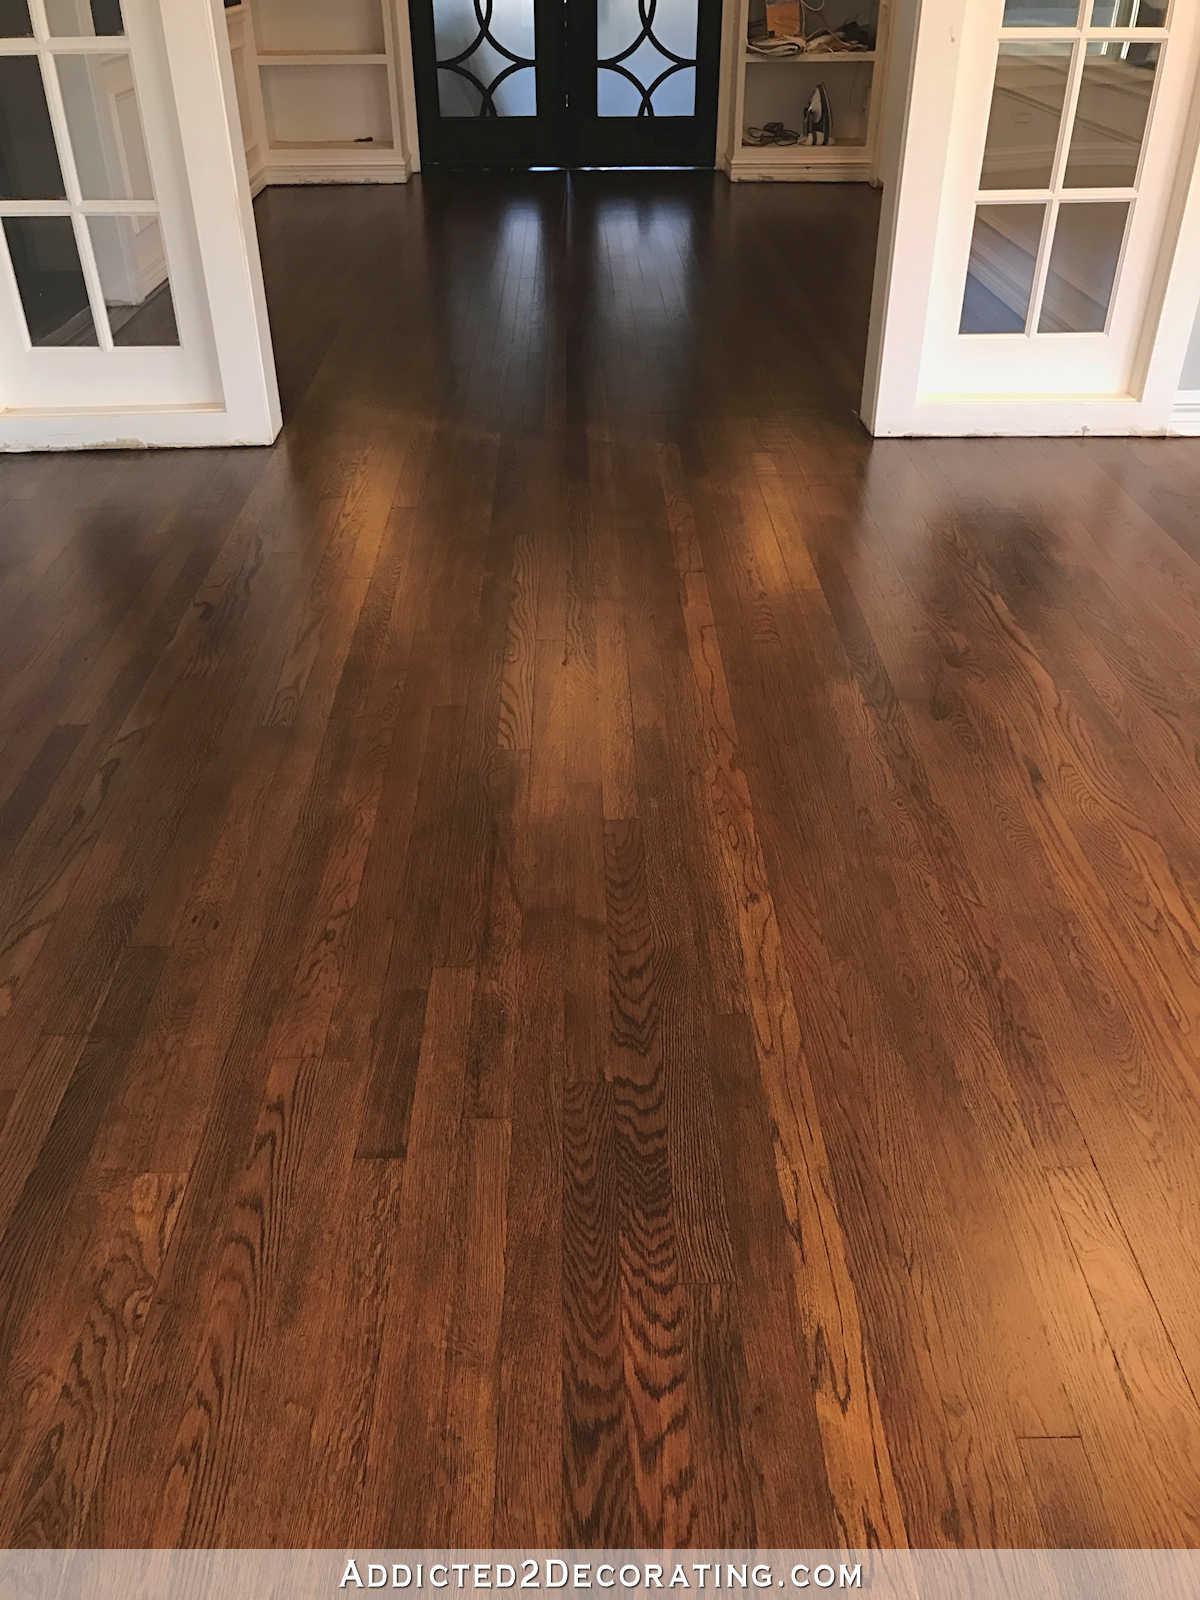 oak hardwood flooring refinished red oak hardwood floors - entryway and music room KUEWYKA